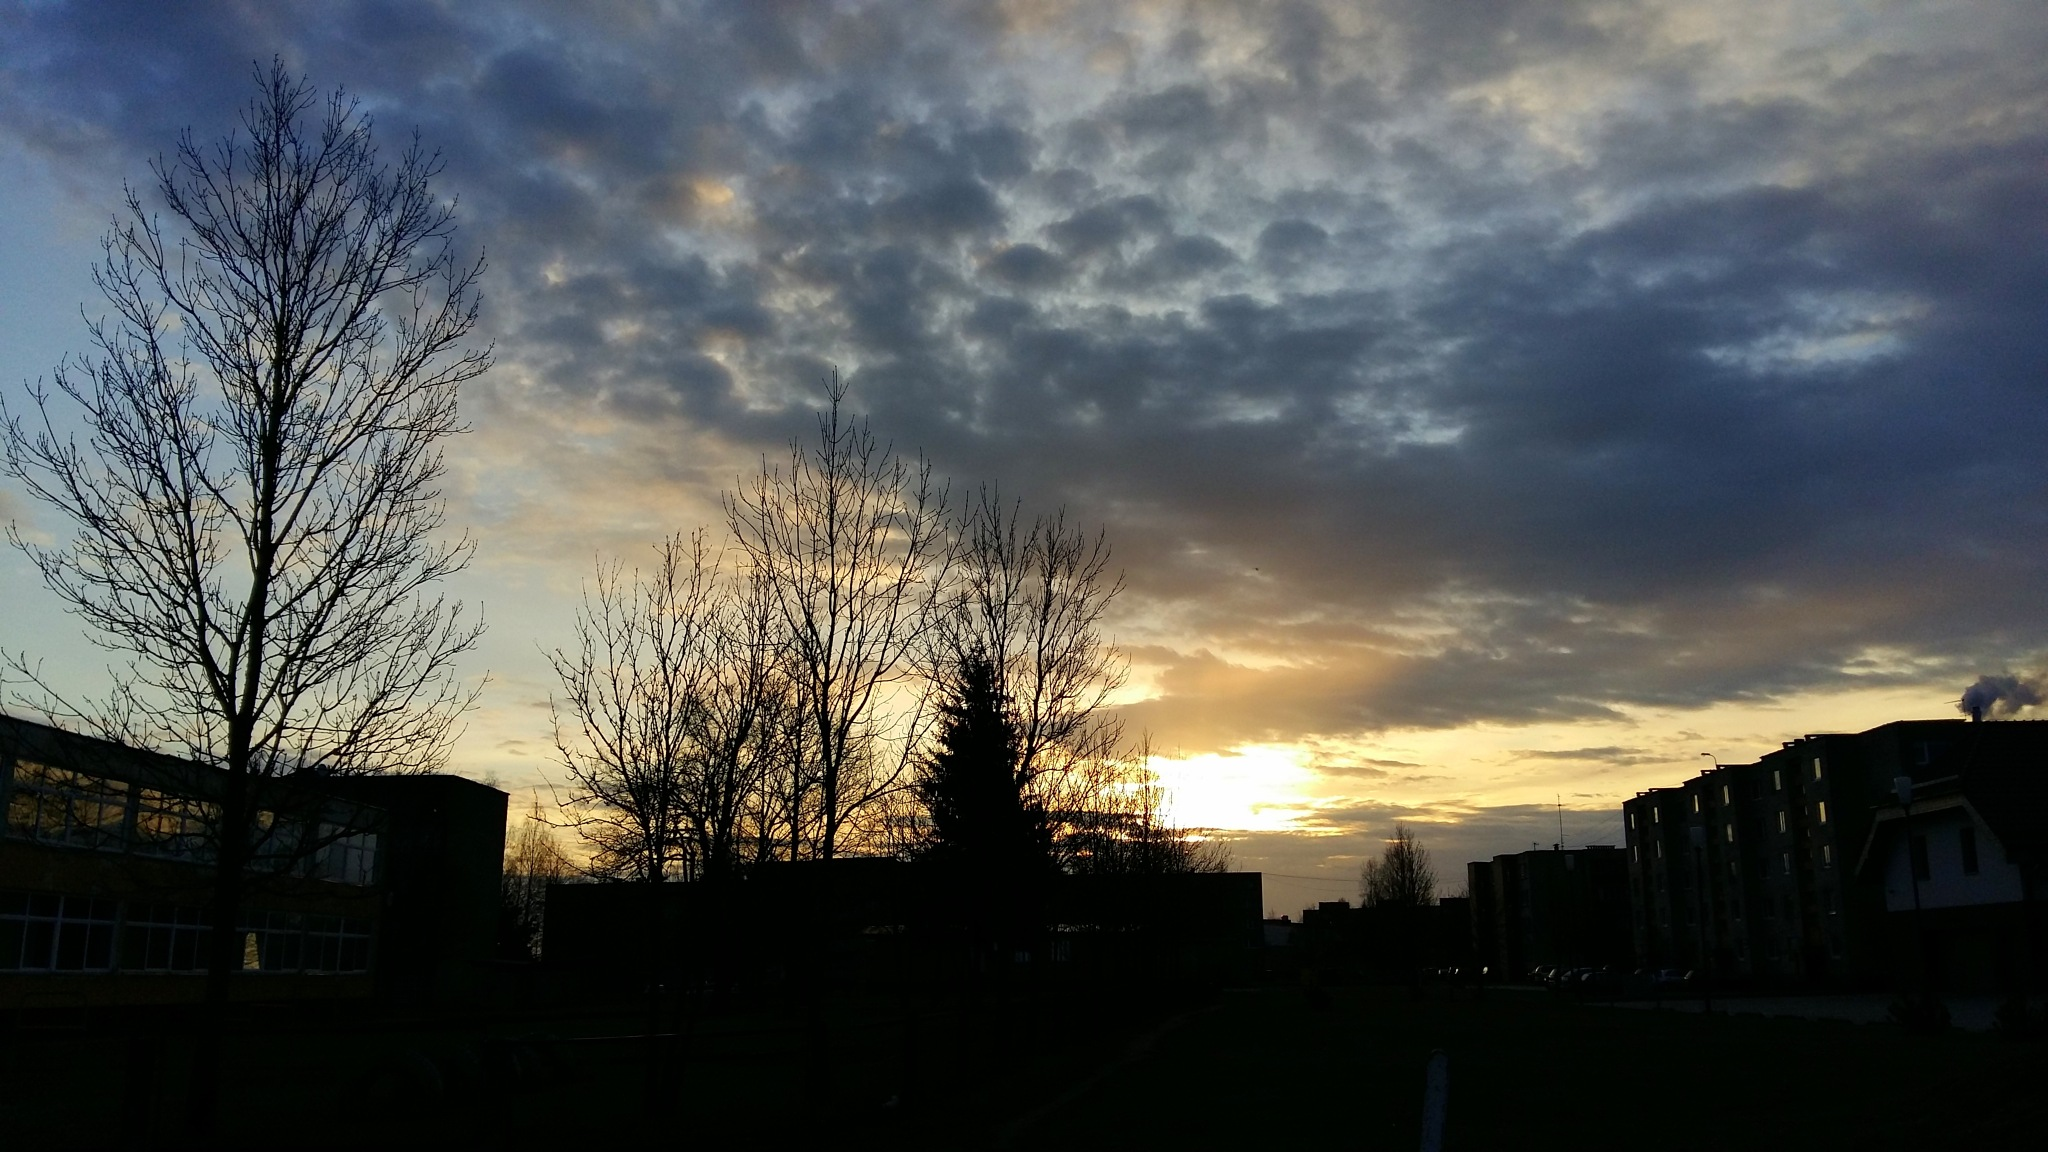 Morning by uzkuraitiene62